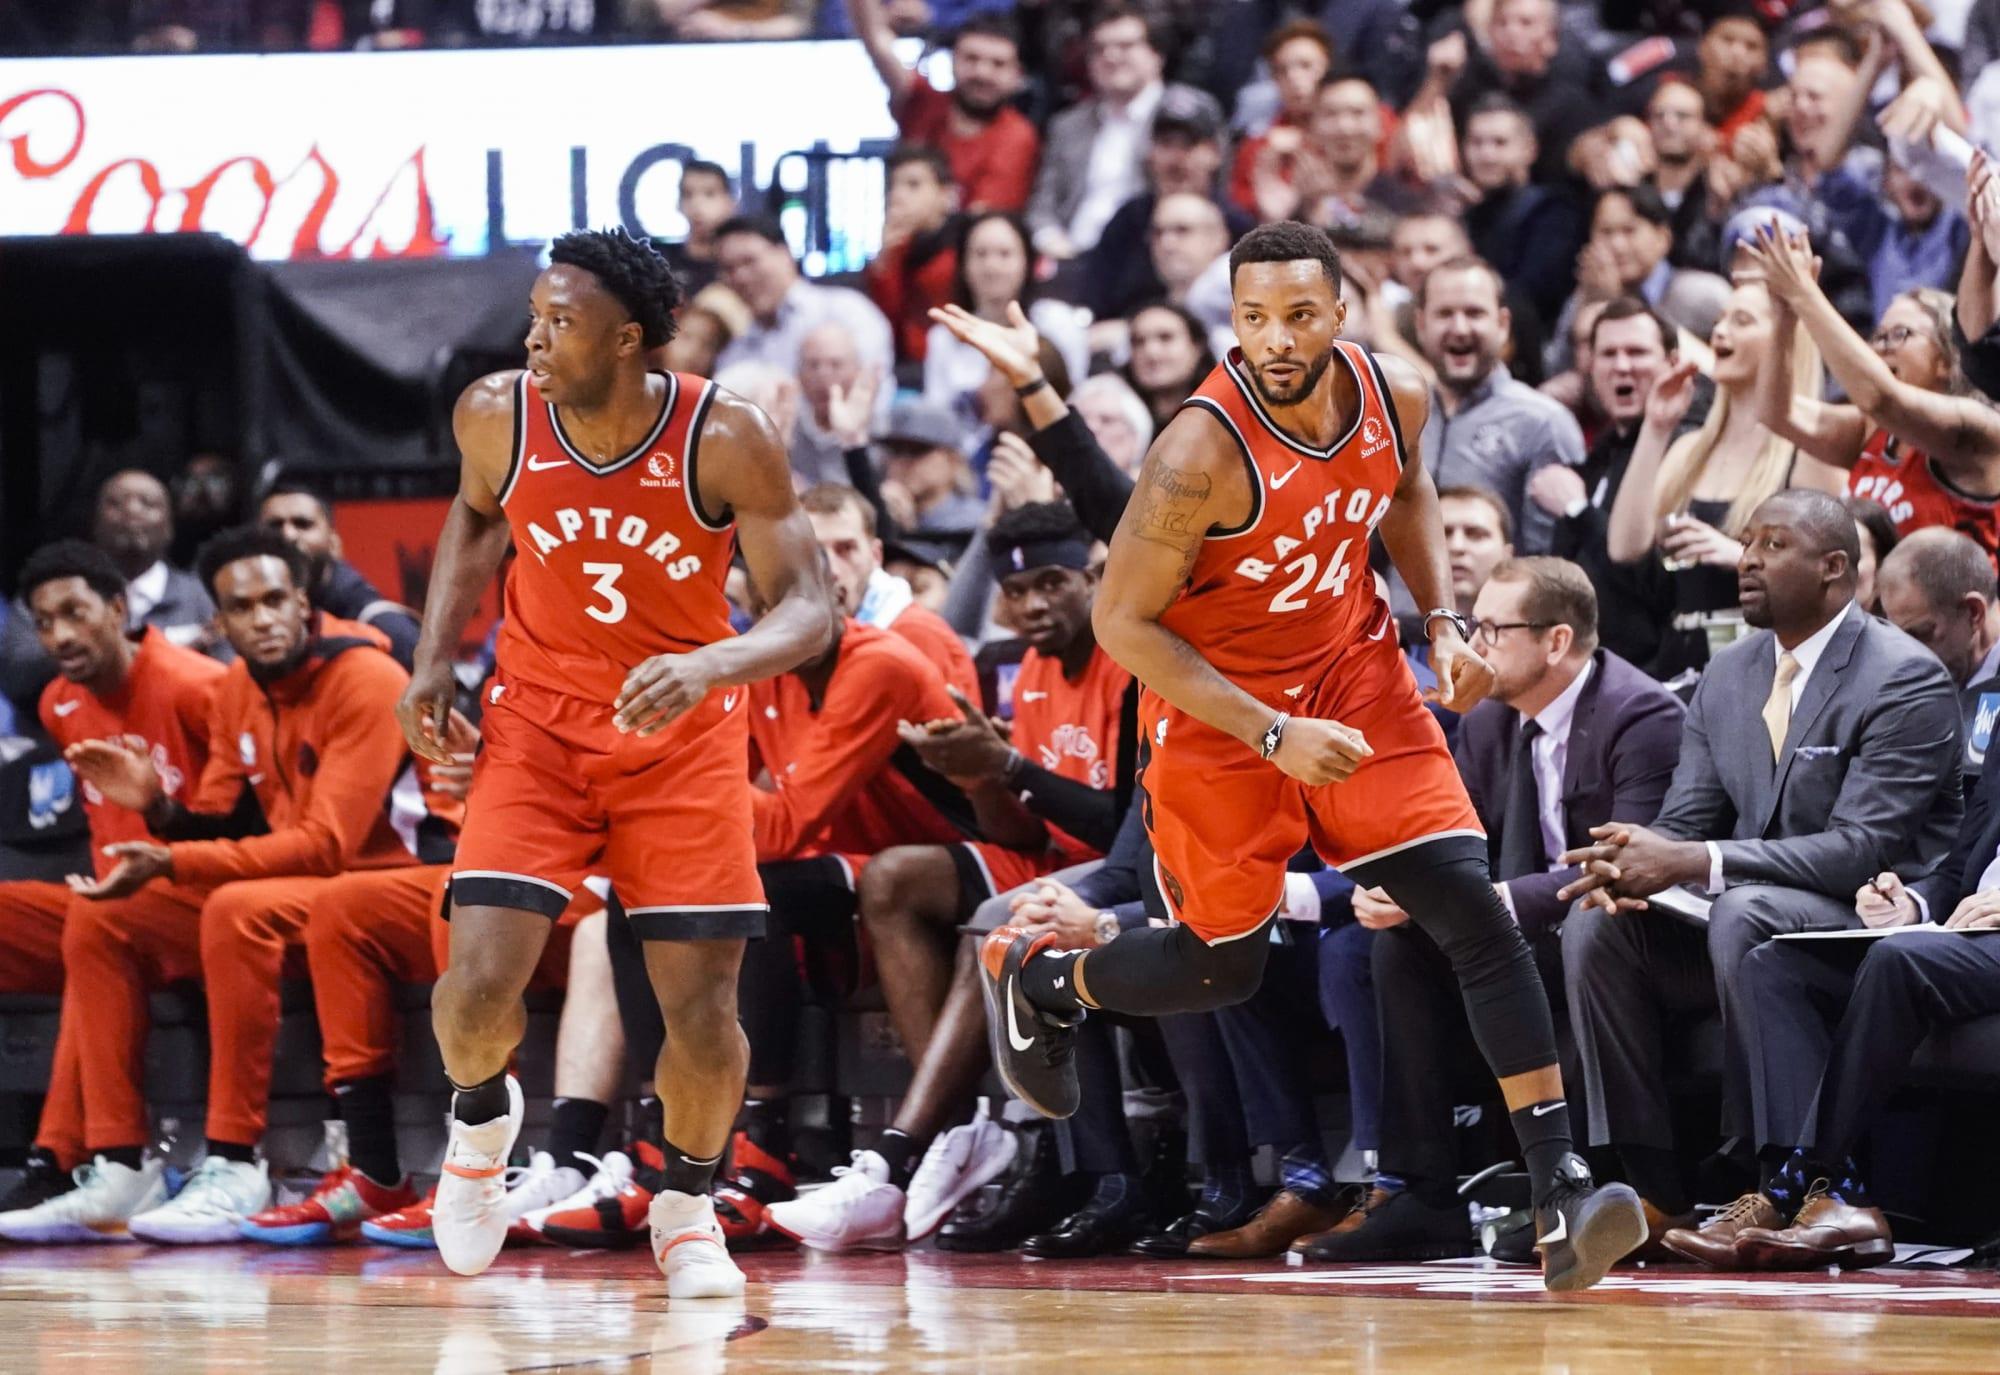 Toronto Raptors NBA schedule release: February will be biggest challenge for team